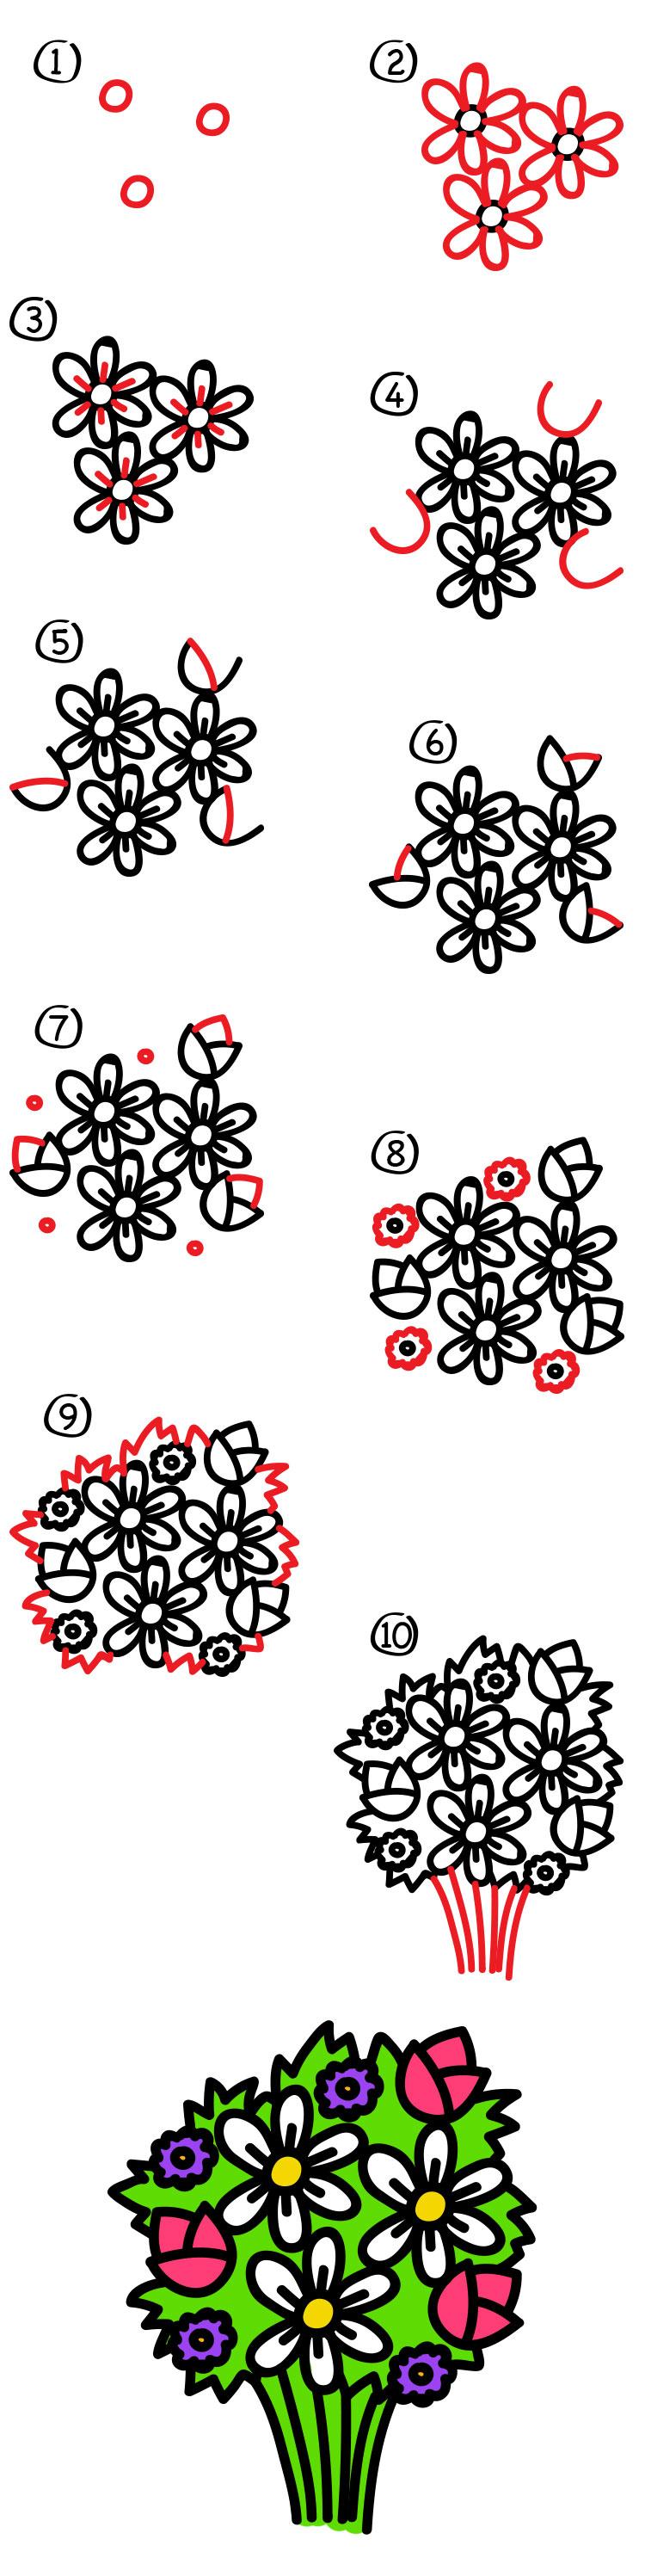 How to draw a flower bouquet art for kids hub art